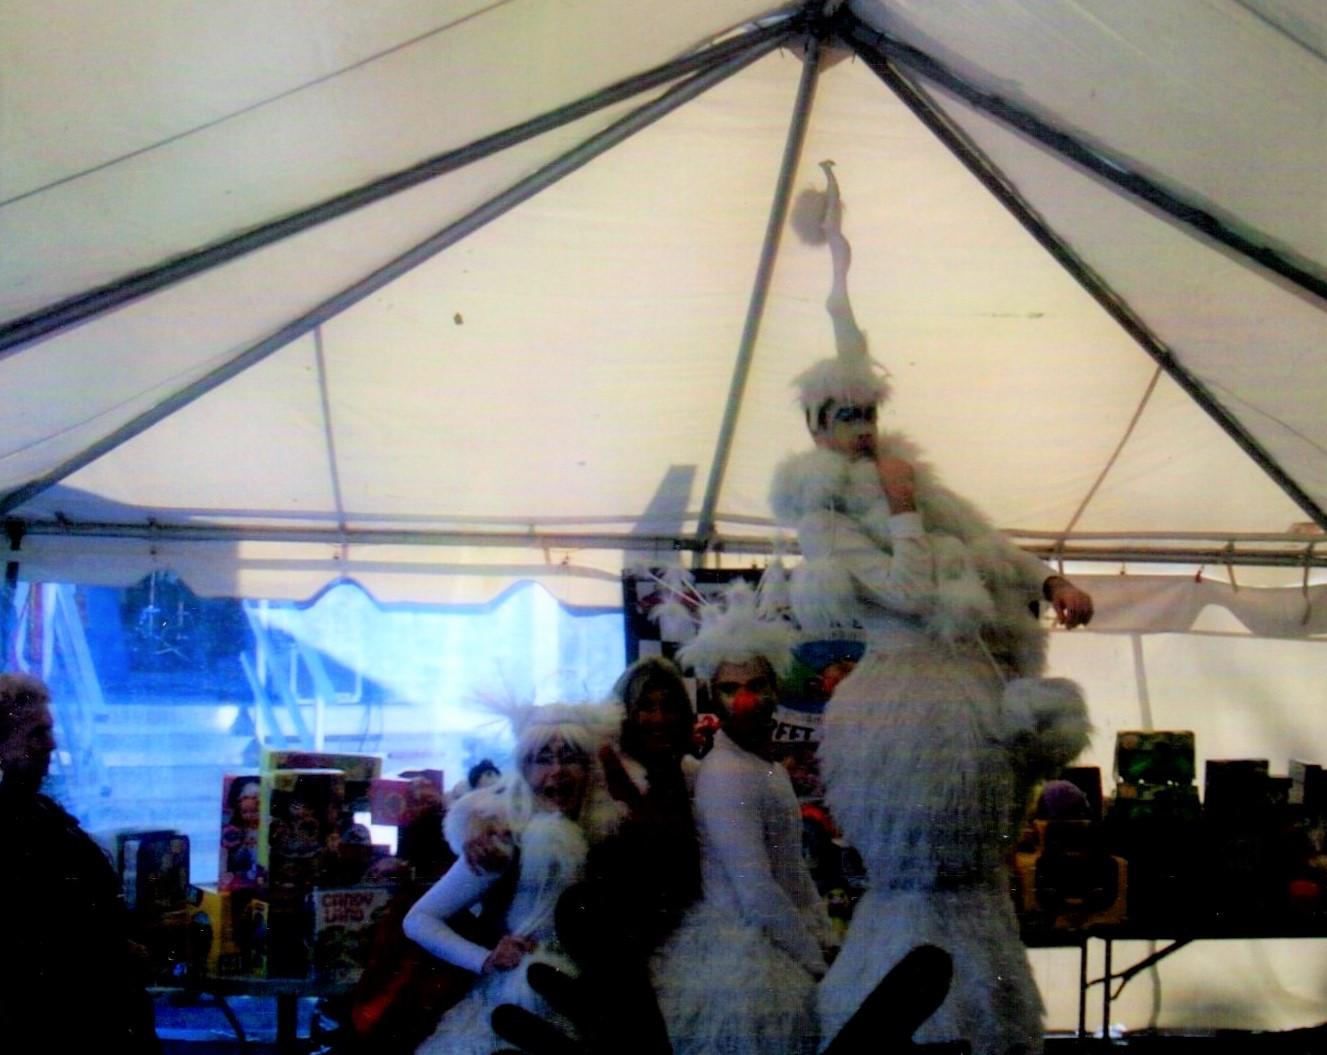 Cirque du Soleil performers entertaining everyone